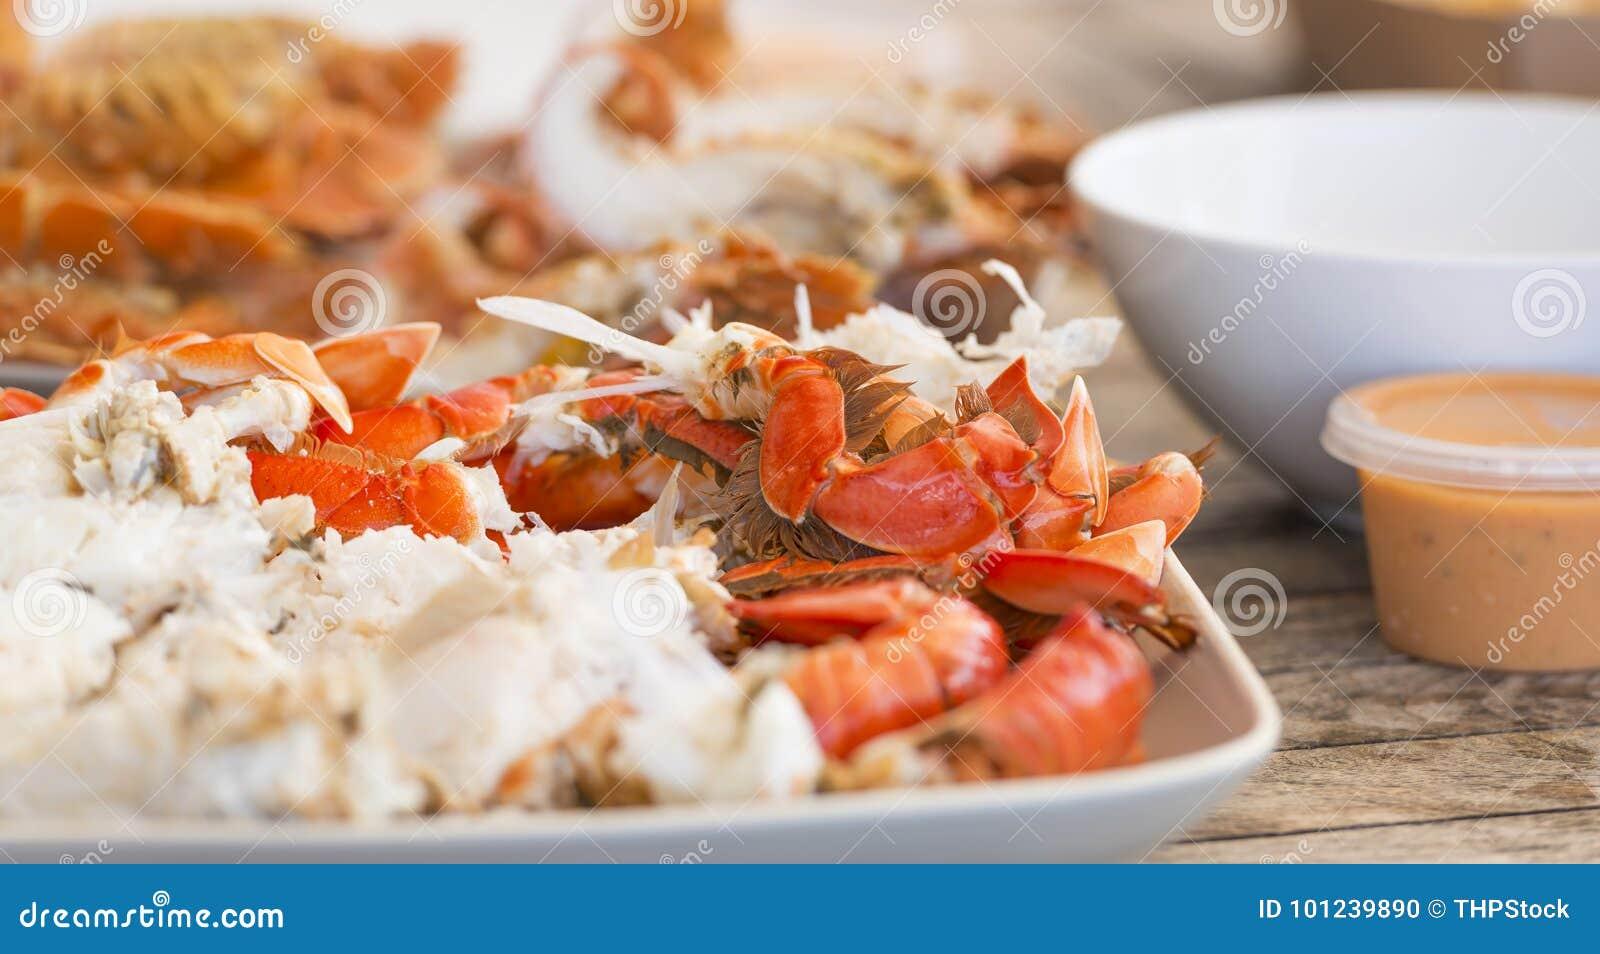 Seafood Platter Australia Stock Photo Image Of Outdoor 101239890